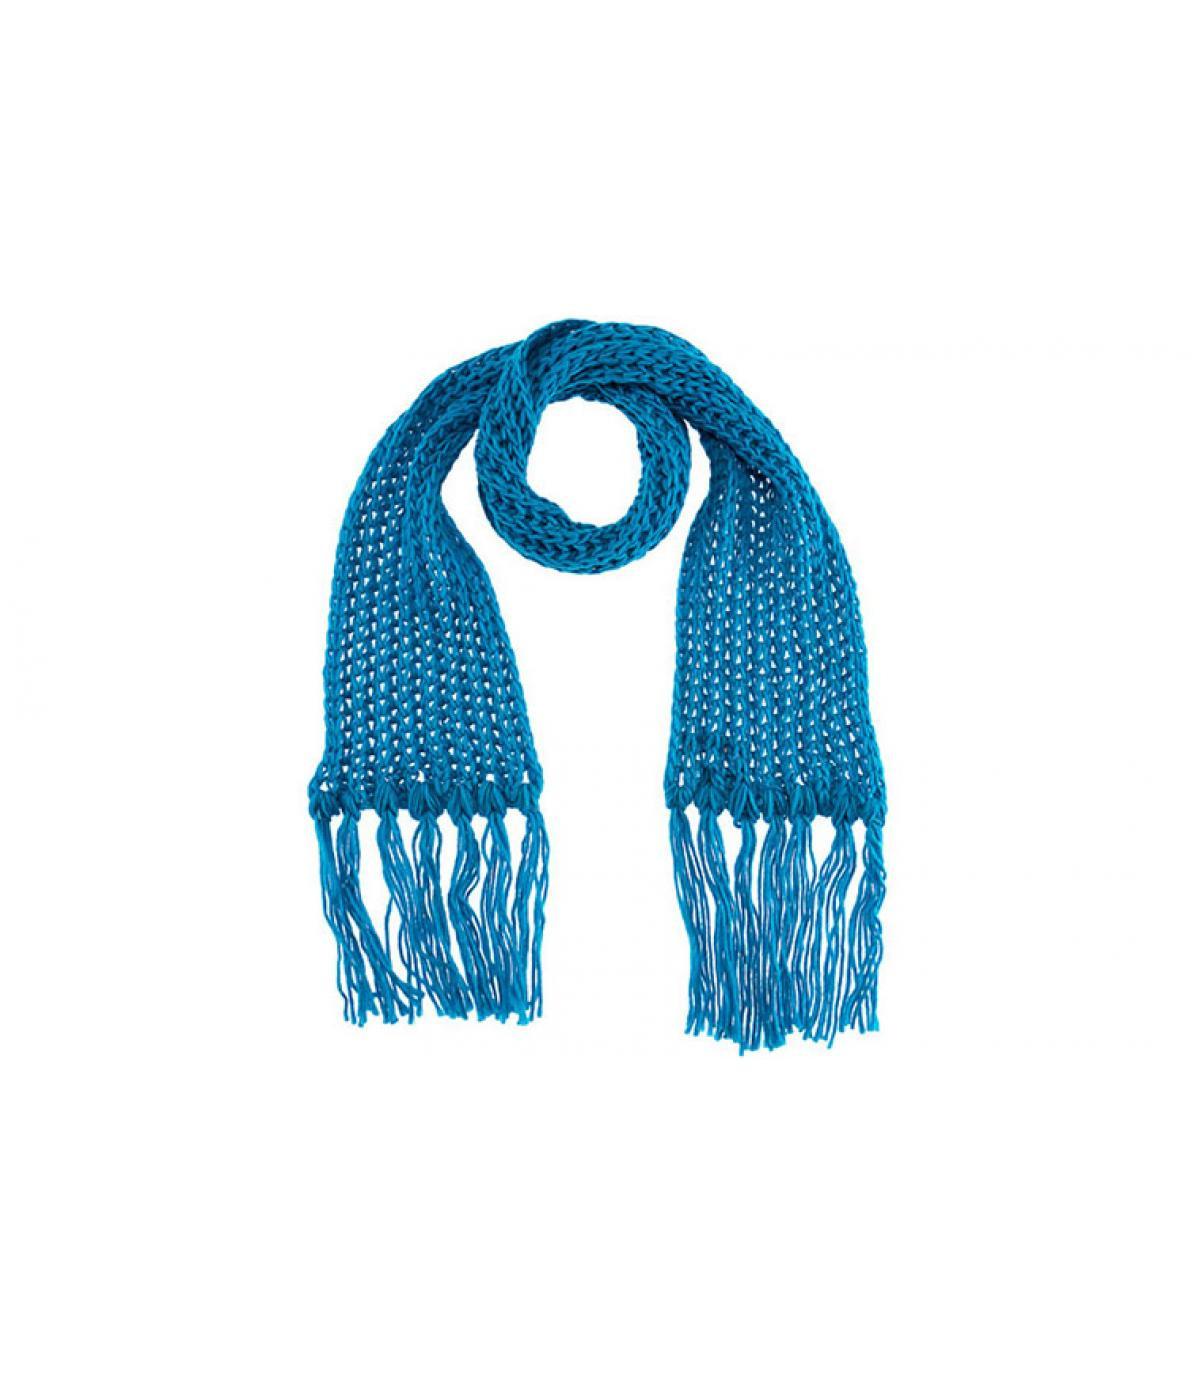 Bufanda turquoise passigatti